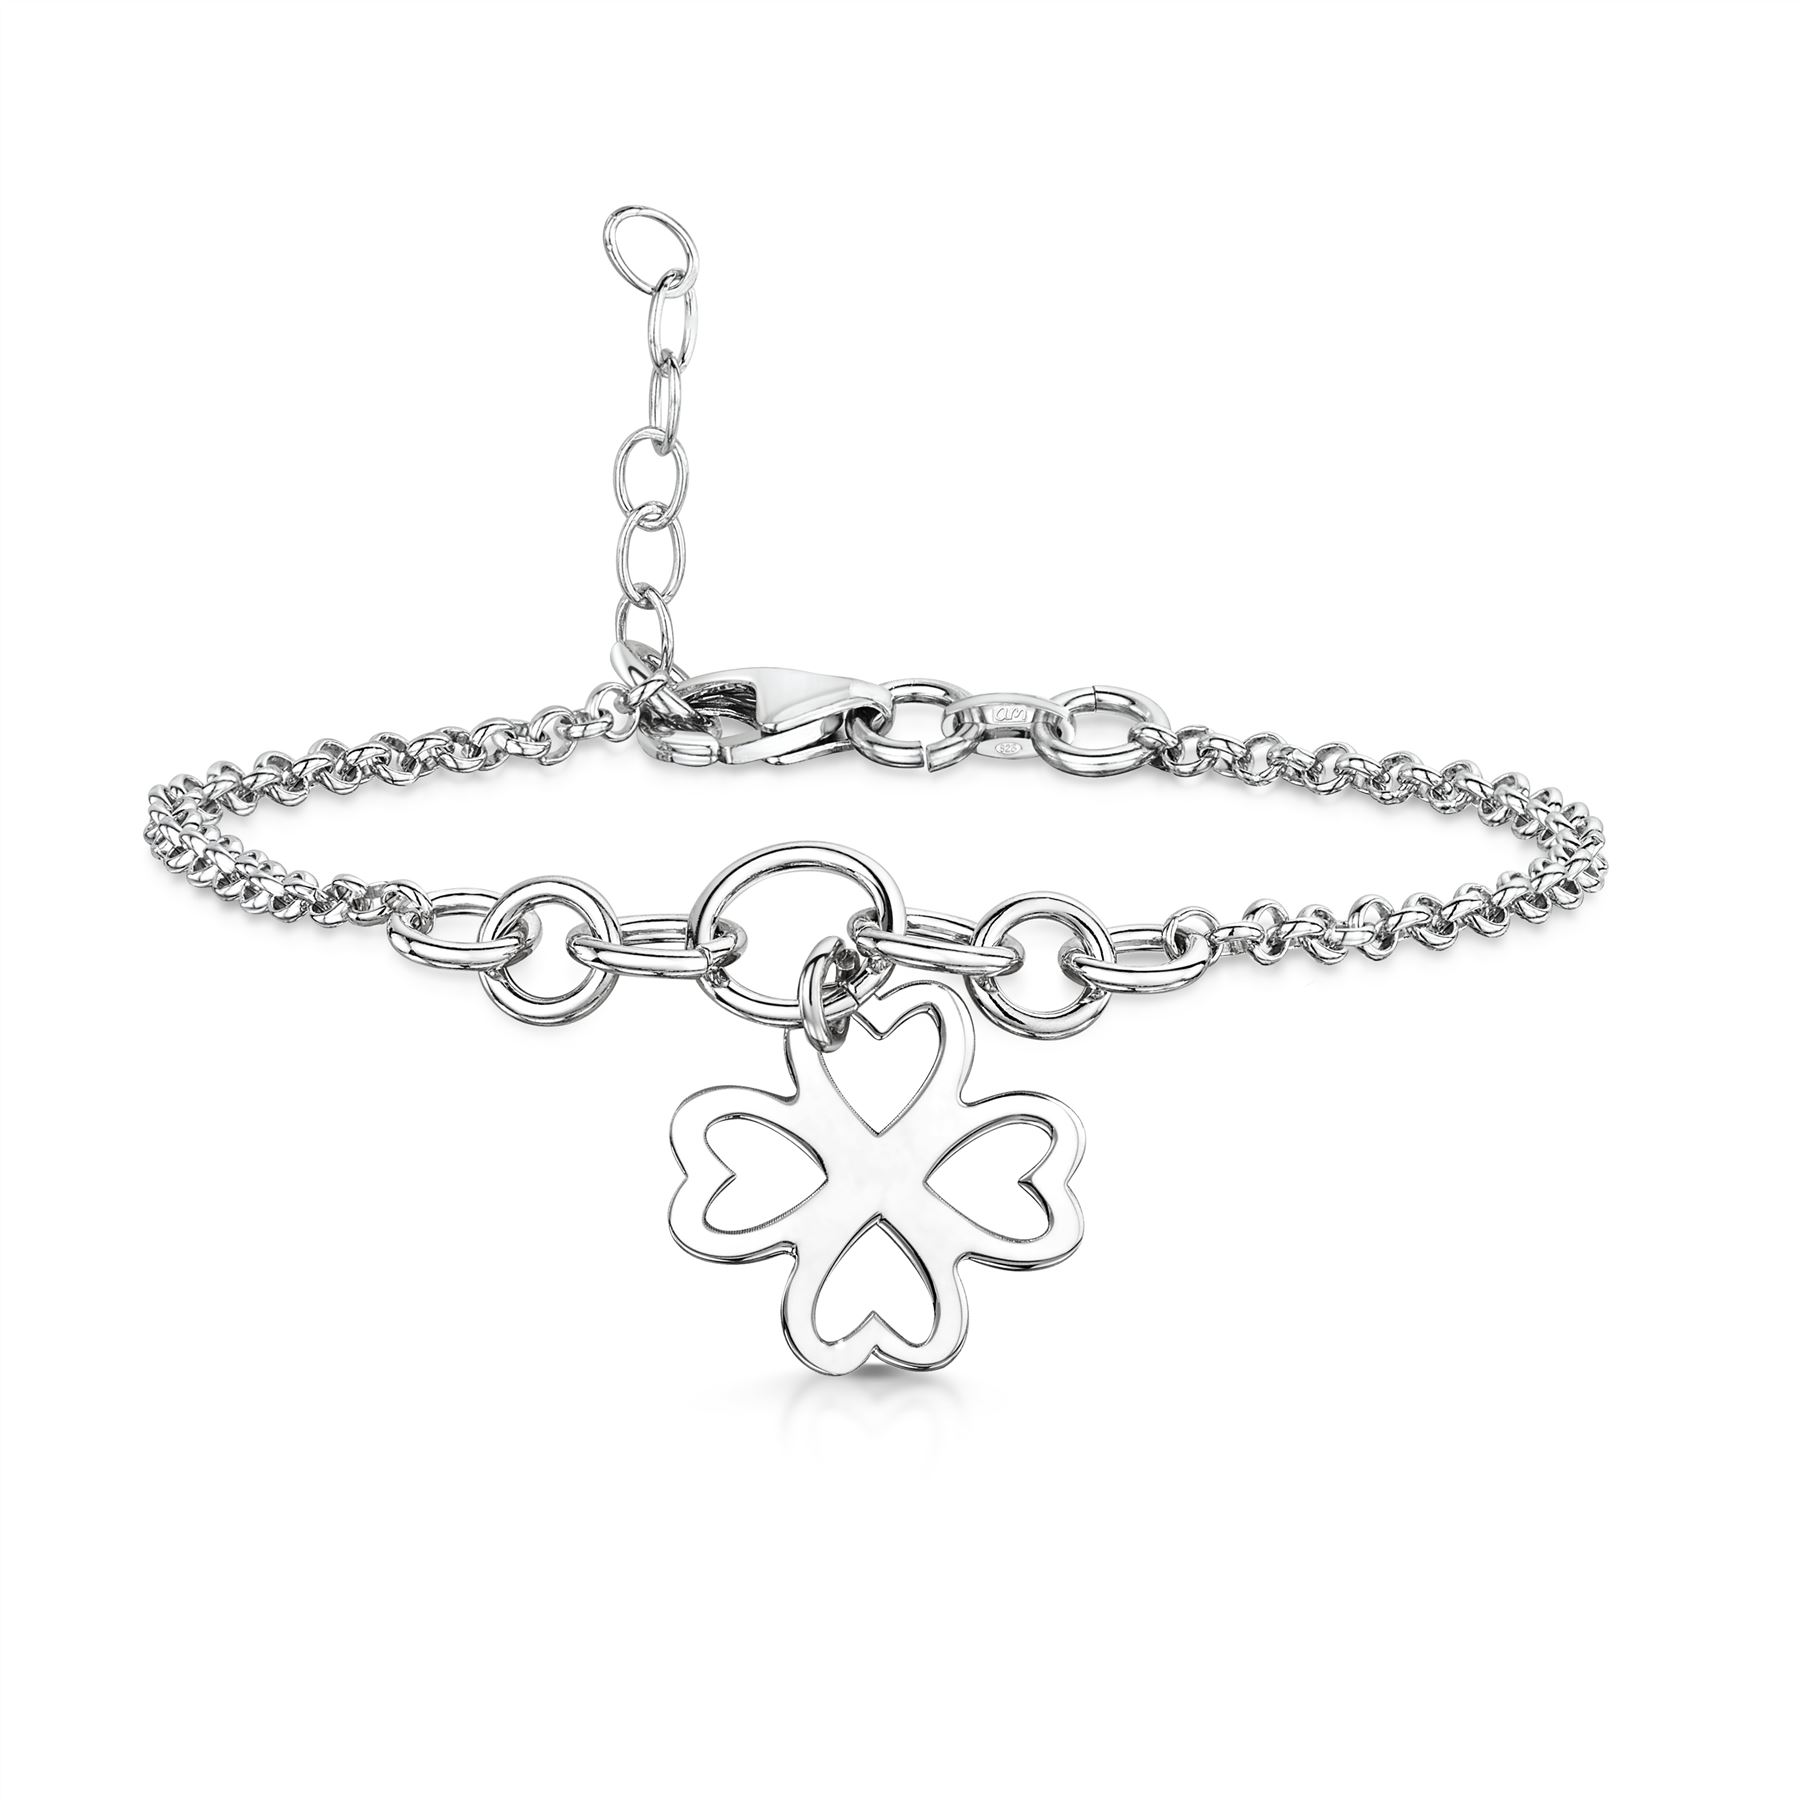 Amberta-Jewelry-925-Sterling-Silver-Adjustable-Bracelet-Italian-Bangle-for-Women thumbnail 72